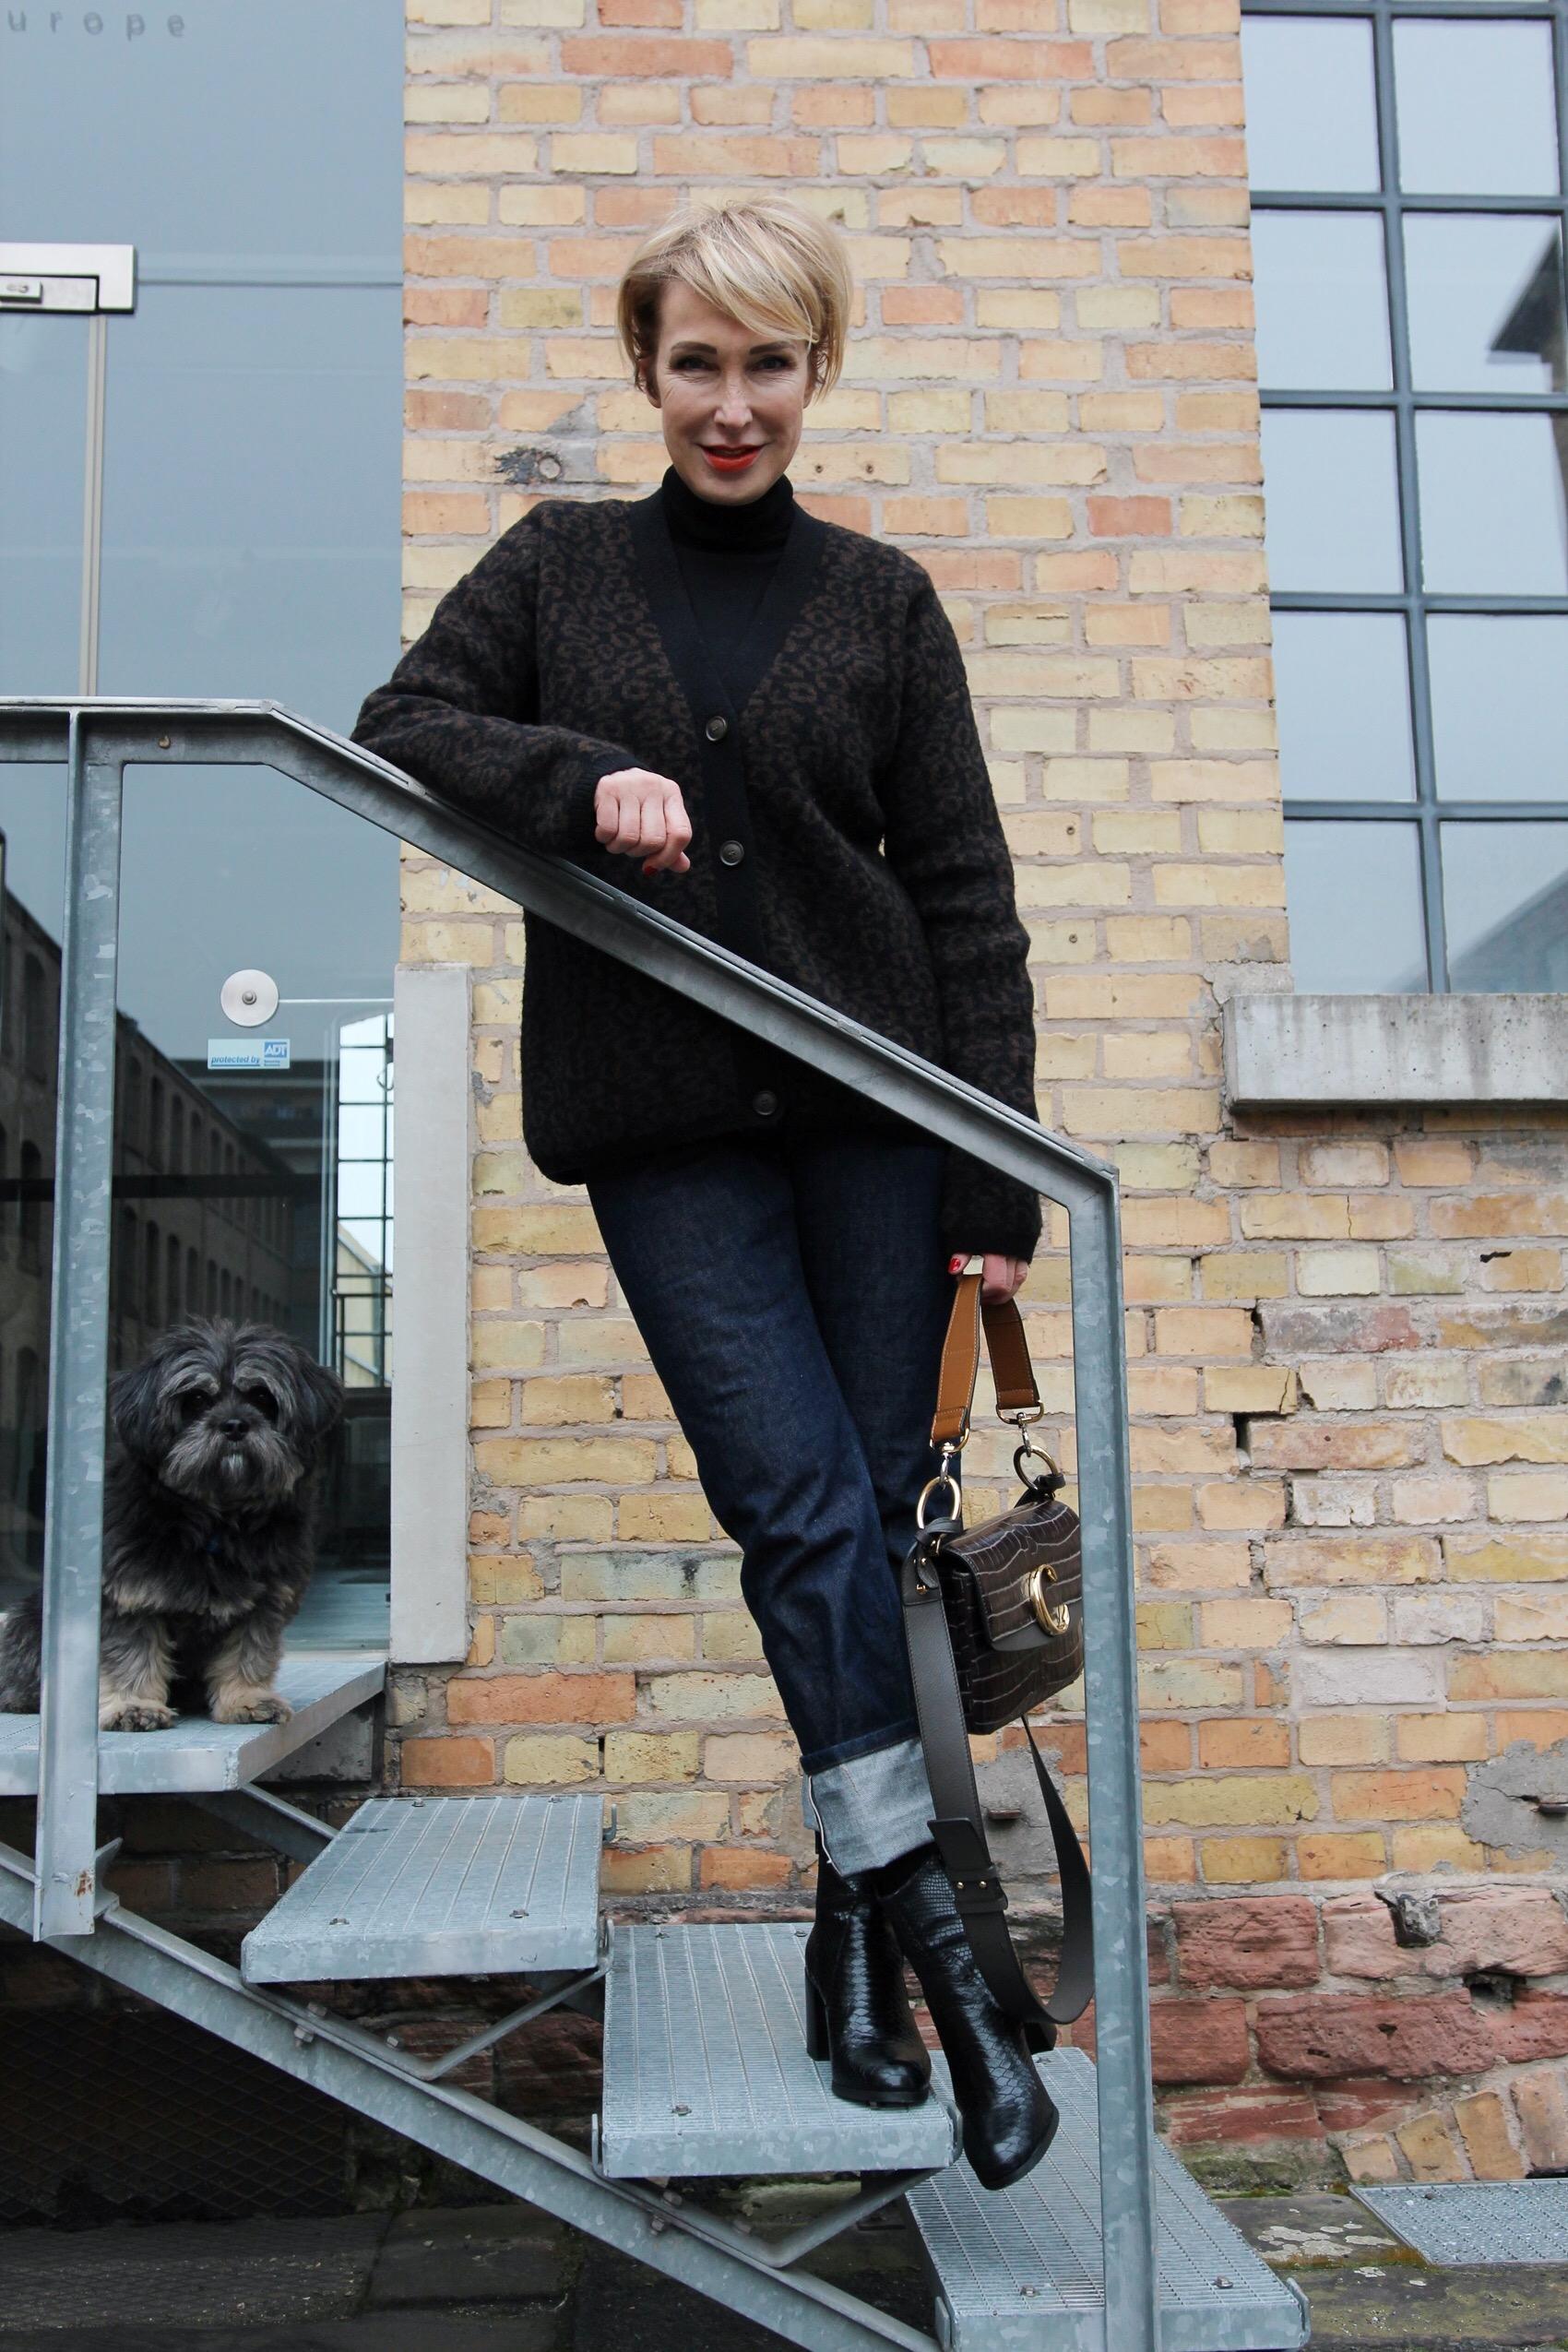 Glamupyourlifestyle rollkragenpullover Cardigan ue-40-blog ue-50-blog Modeblog-ue40